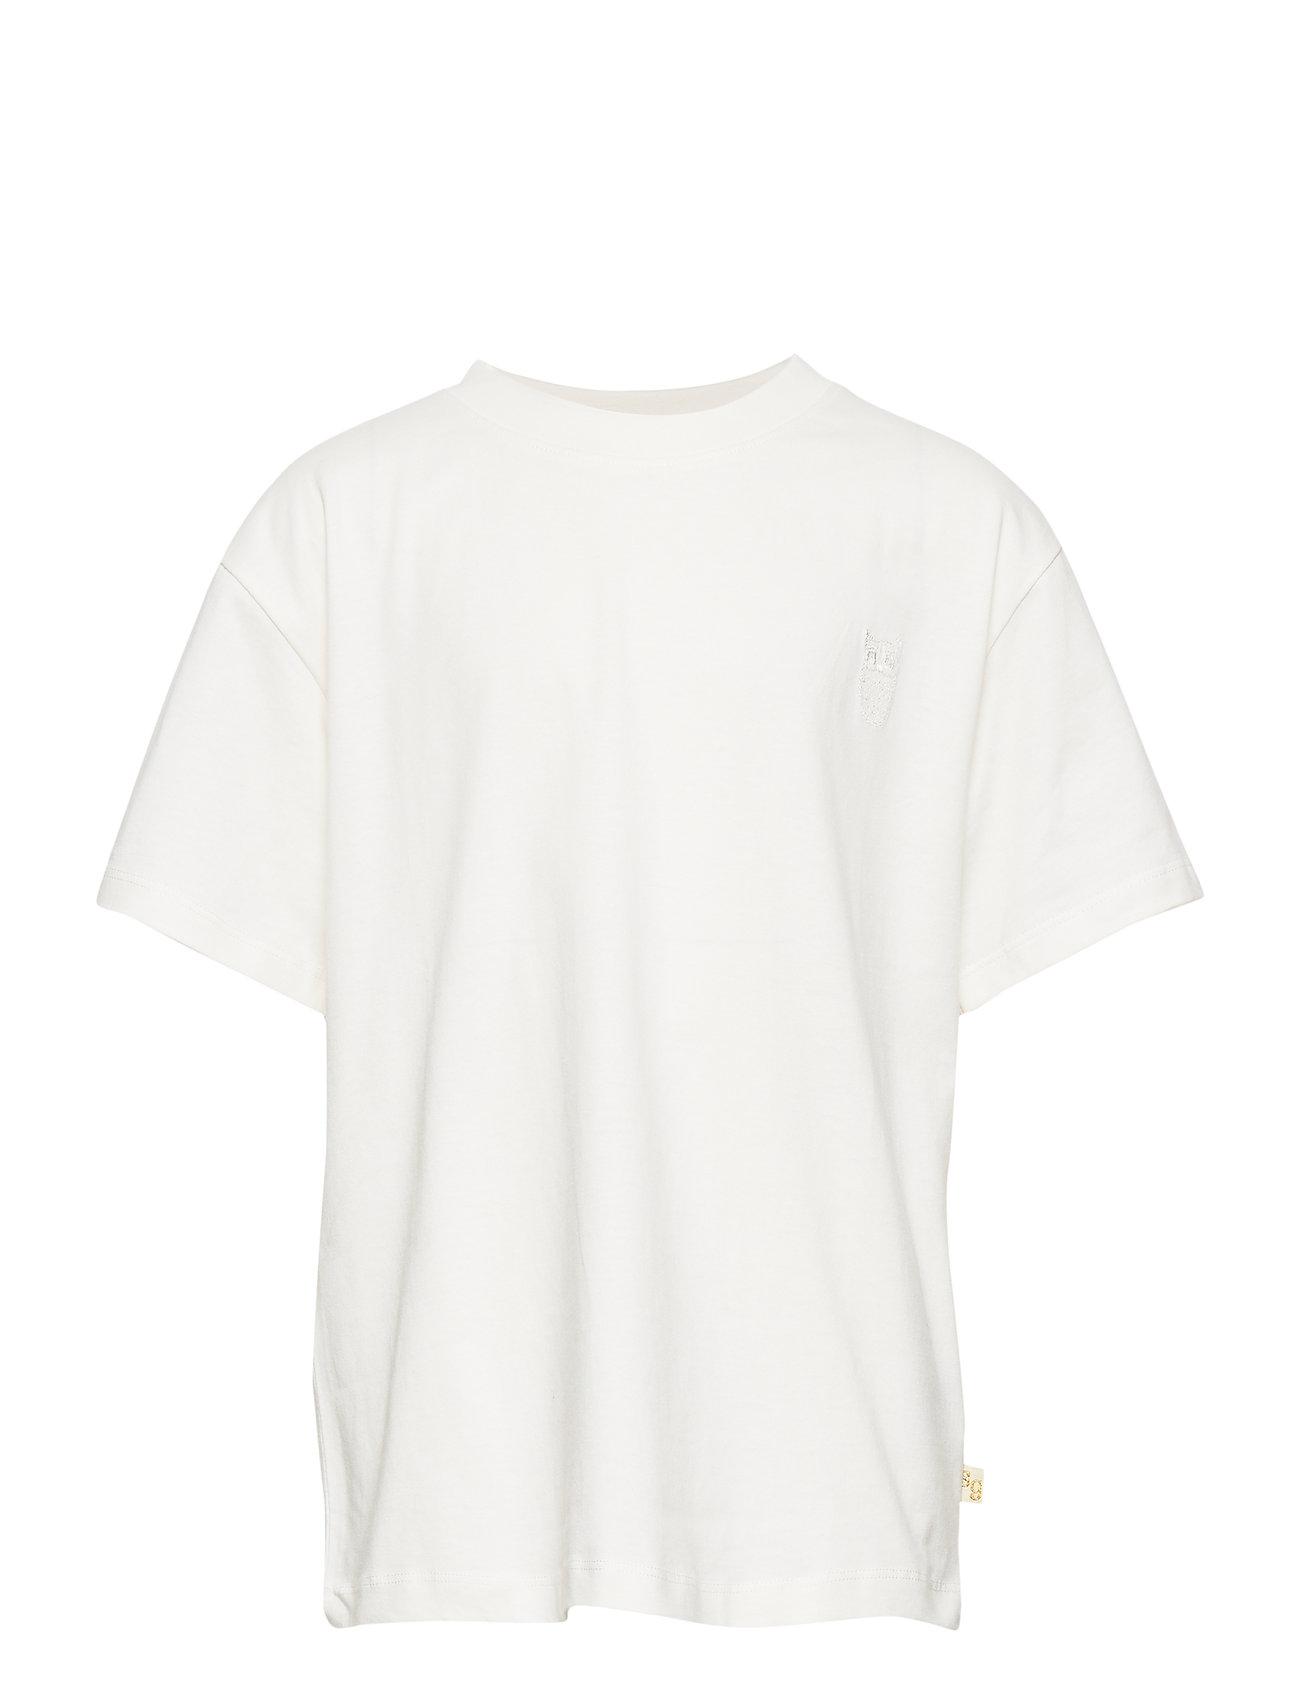 Soft Gallery Asger T-shirt - WHITE, MINI OWL EMB.